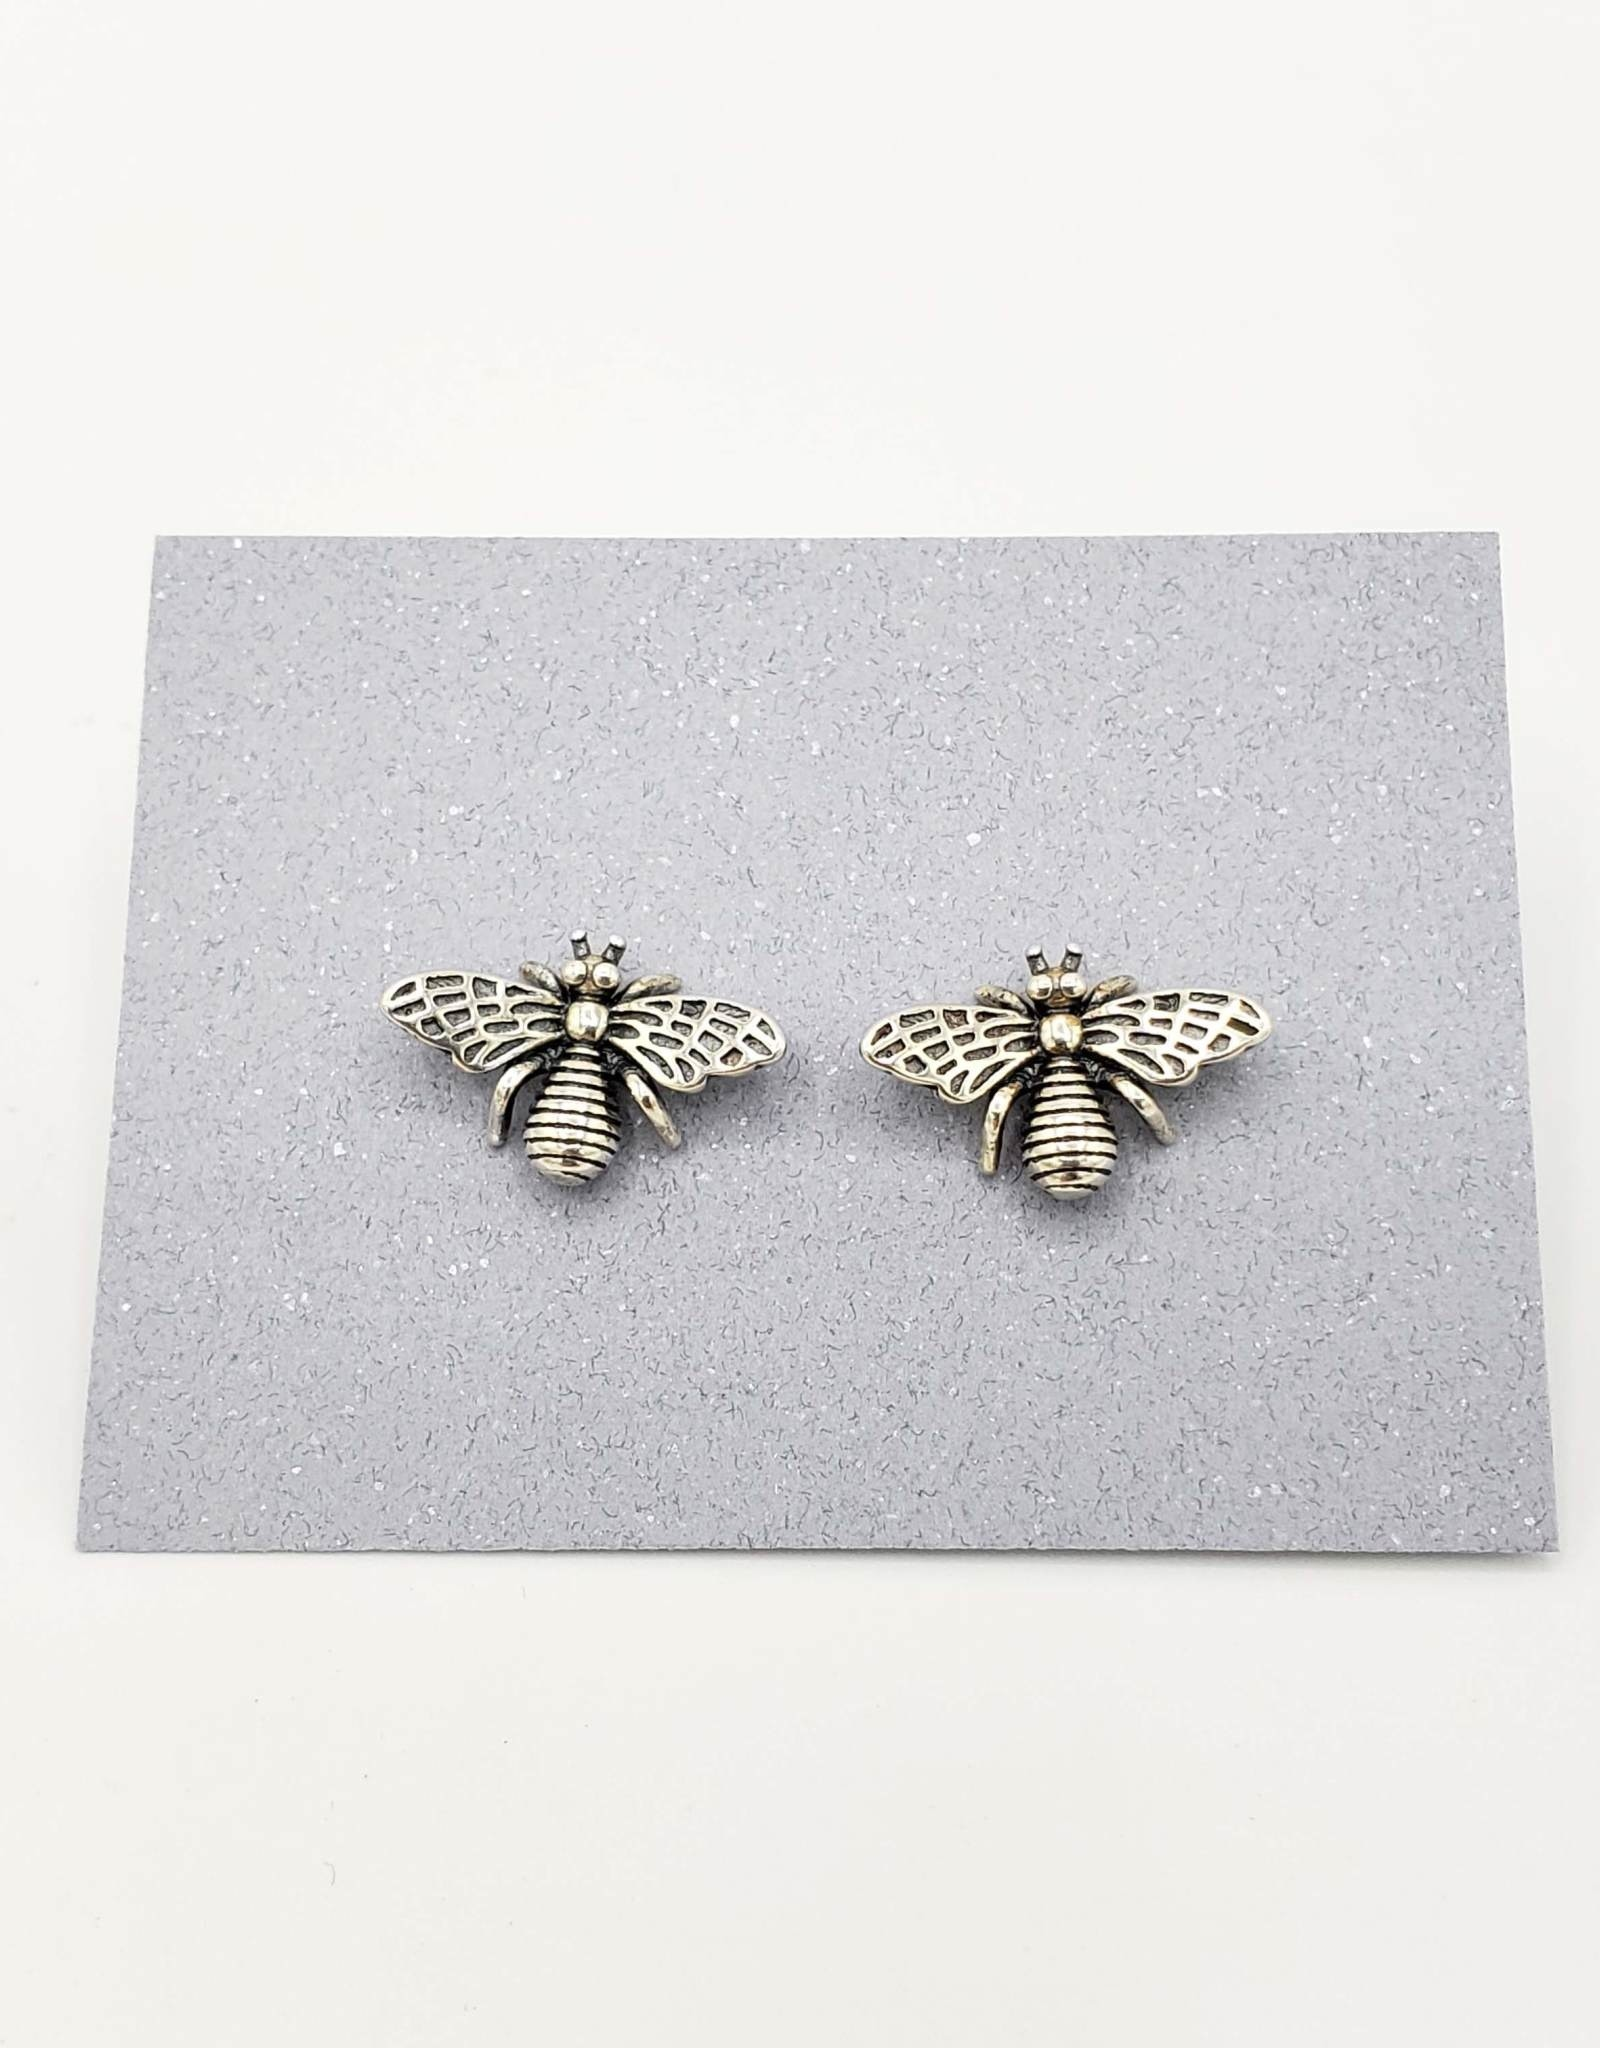 Tiger Mountain Detailed Bee Stud Earrings in Sterling Silver